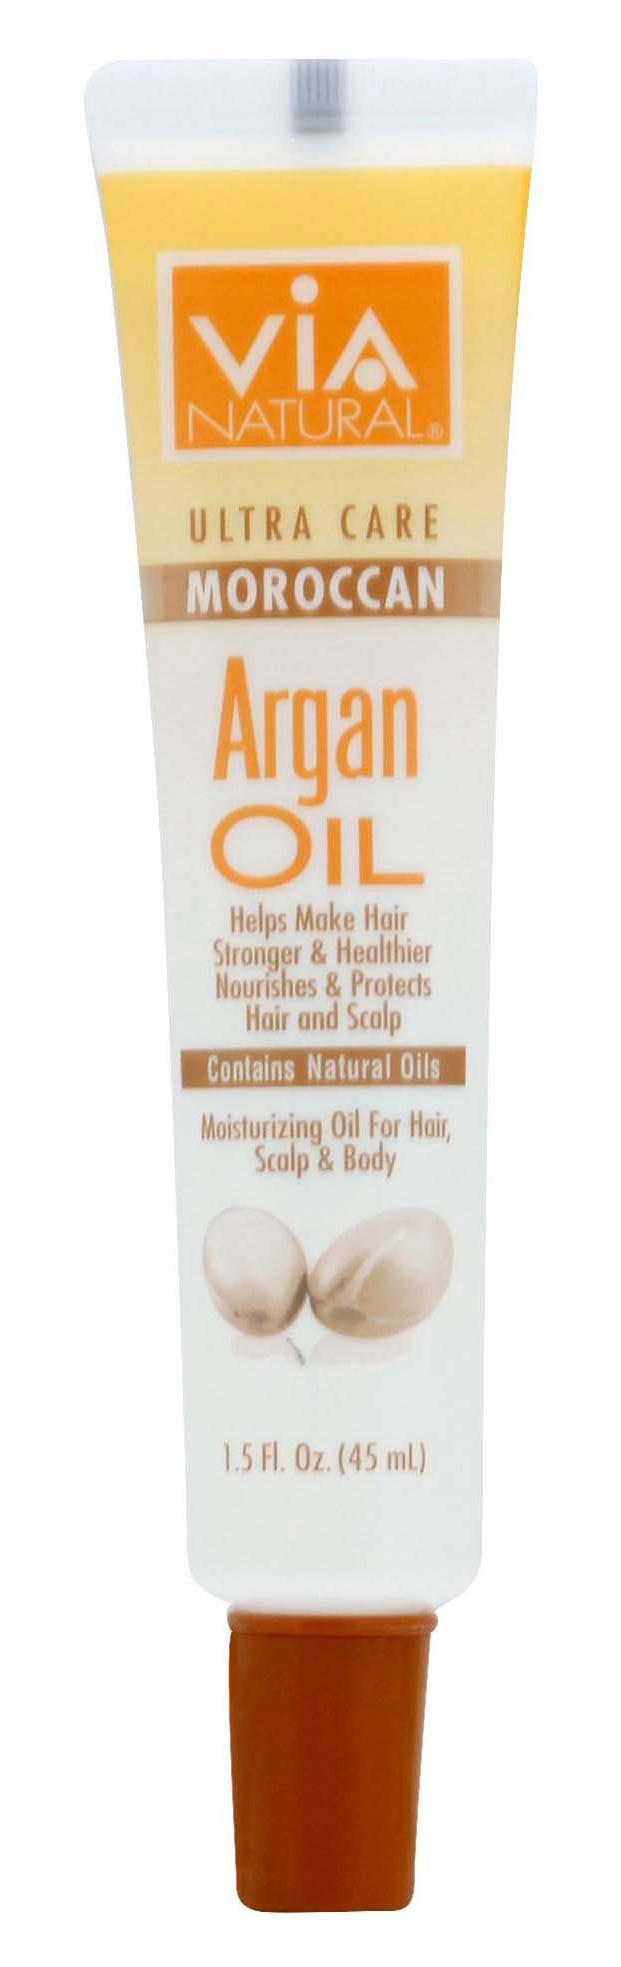 Via Natural Ultra Care Moroccan Argan Oil